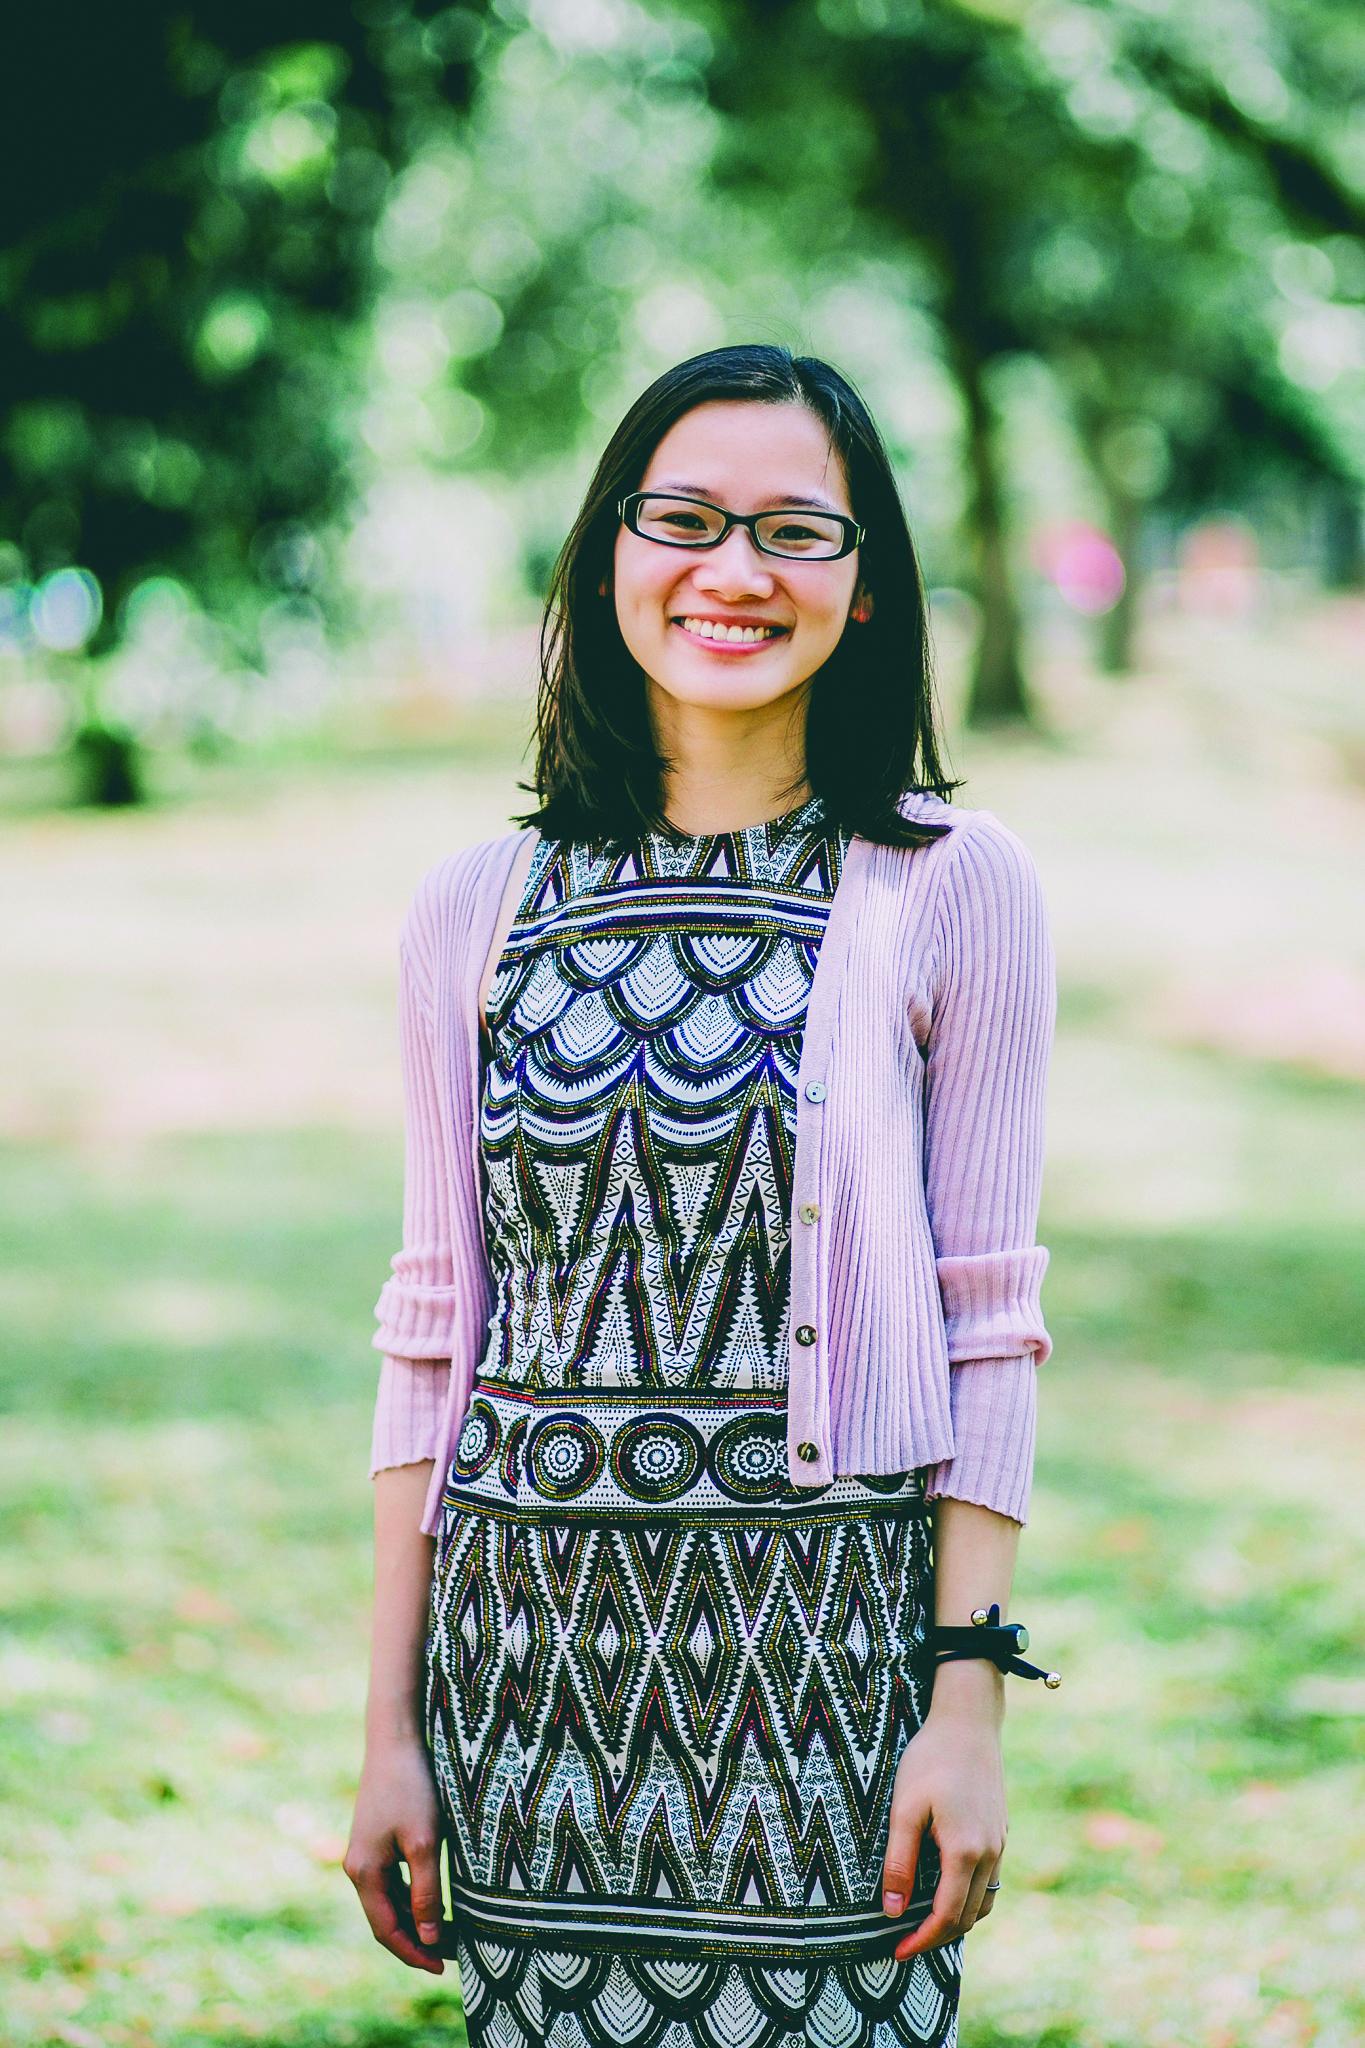 Pamela Ieong, intérprete-tradutora | Um gosto natural pelas línguas